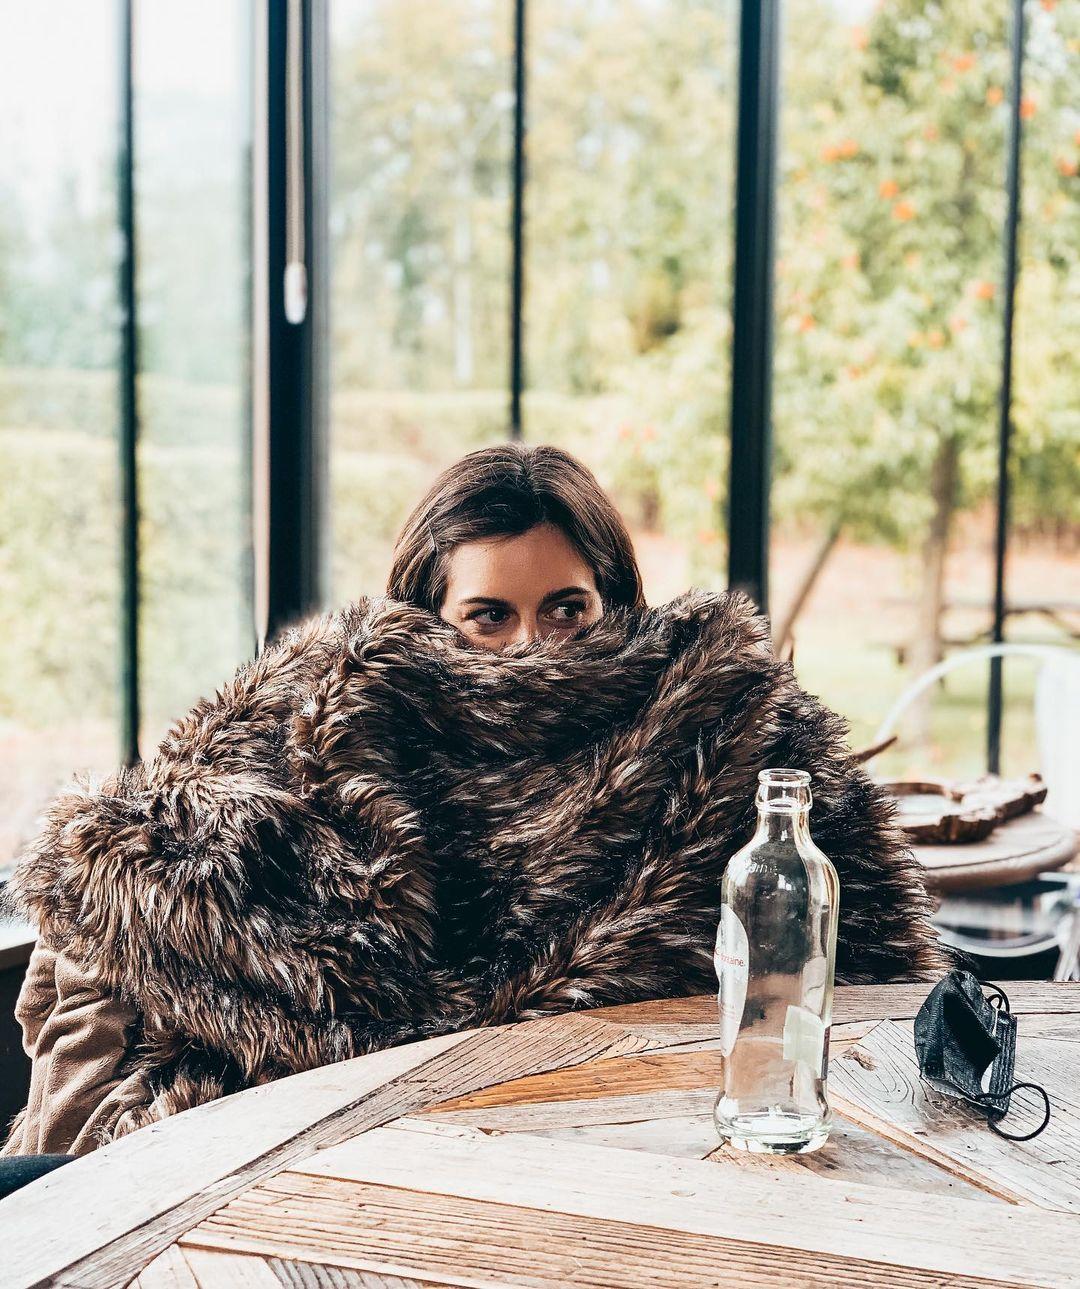 Unlike John Snow, Katrijn knows everything 👀 #curieuzeneuzemosterdpot • #strategytribe #johnsnow #katrijnsnow #officevibes #frolleagues #officeinspo #winteriscoming #tribes #teamwork #employerbranding